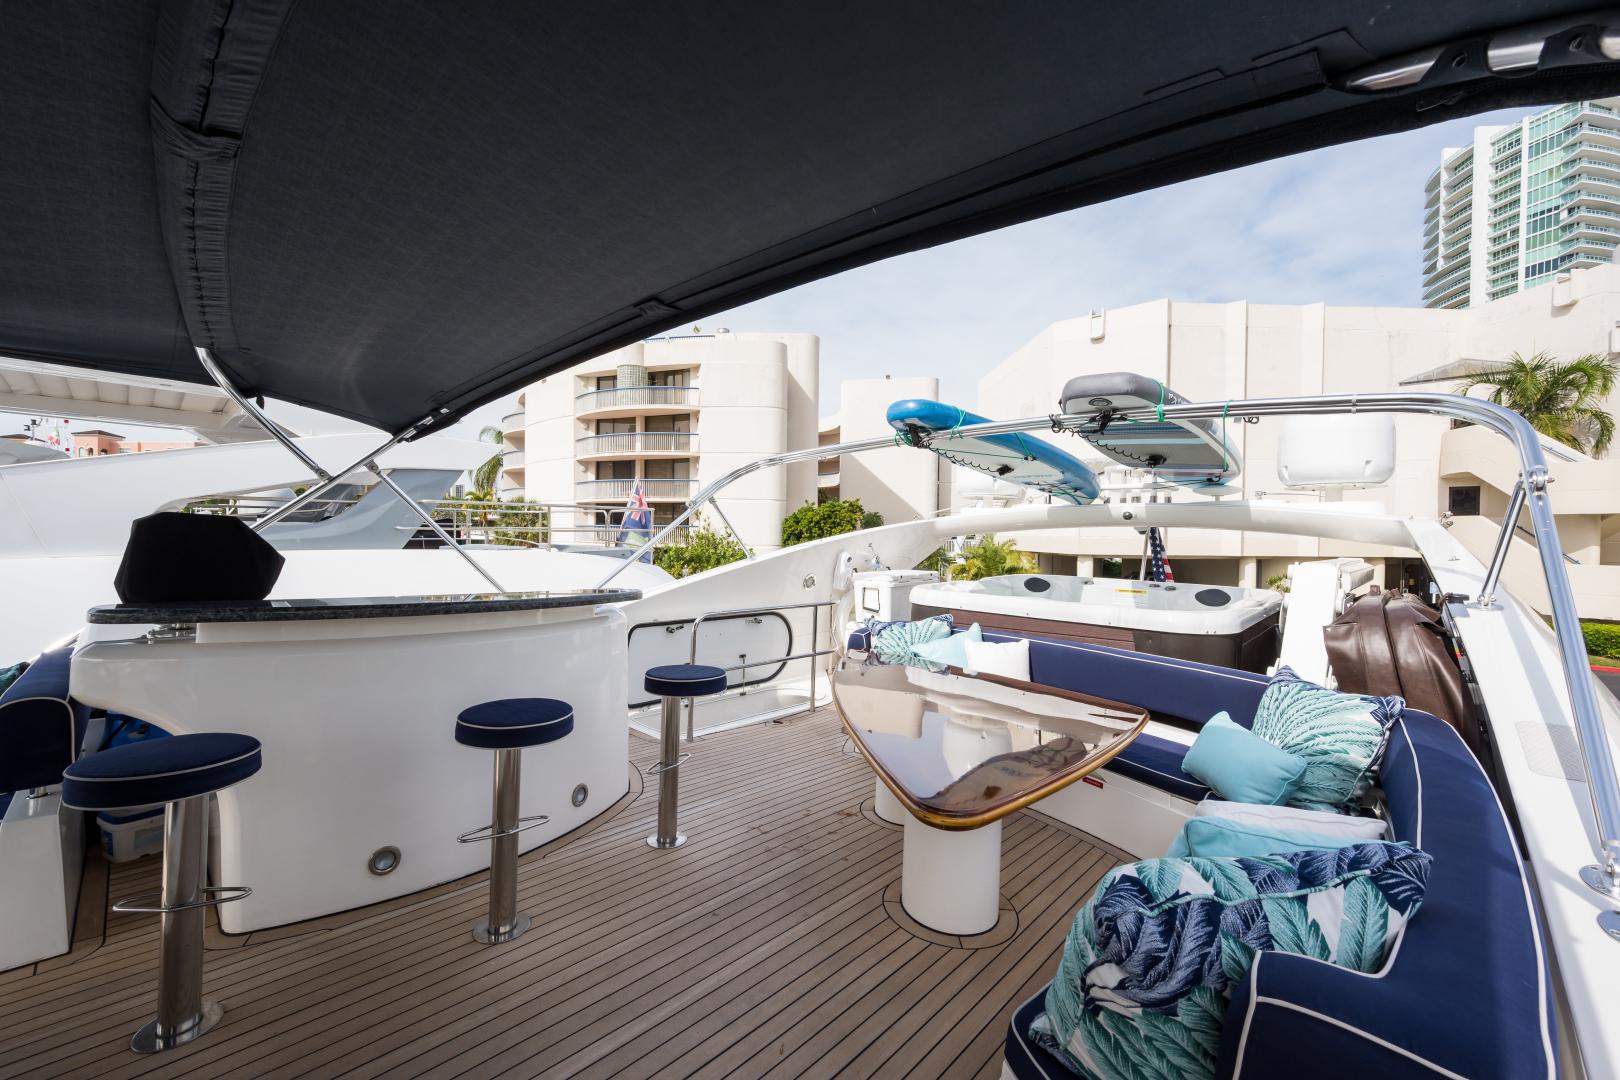 Sunseeker-Yacht 2004-TOP GUN Aventura-Florida-United States-1450718 | Thumbnail